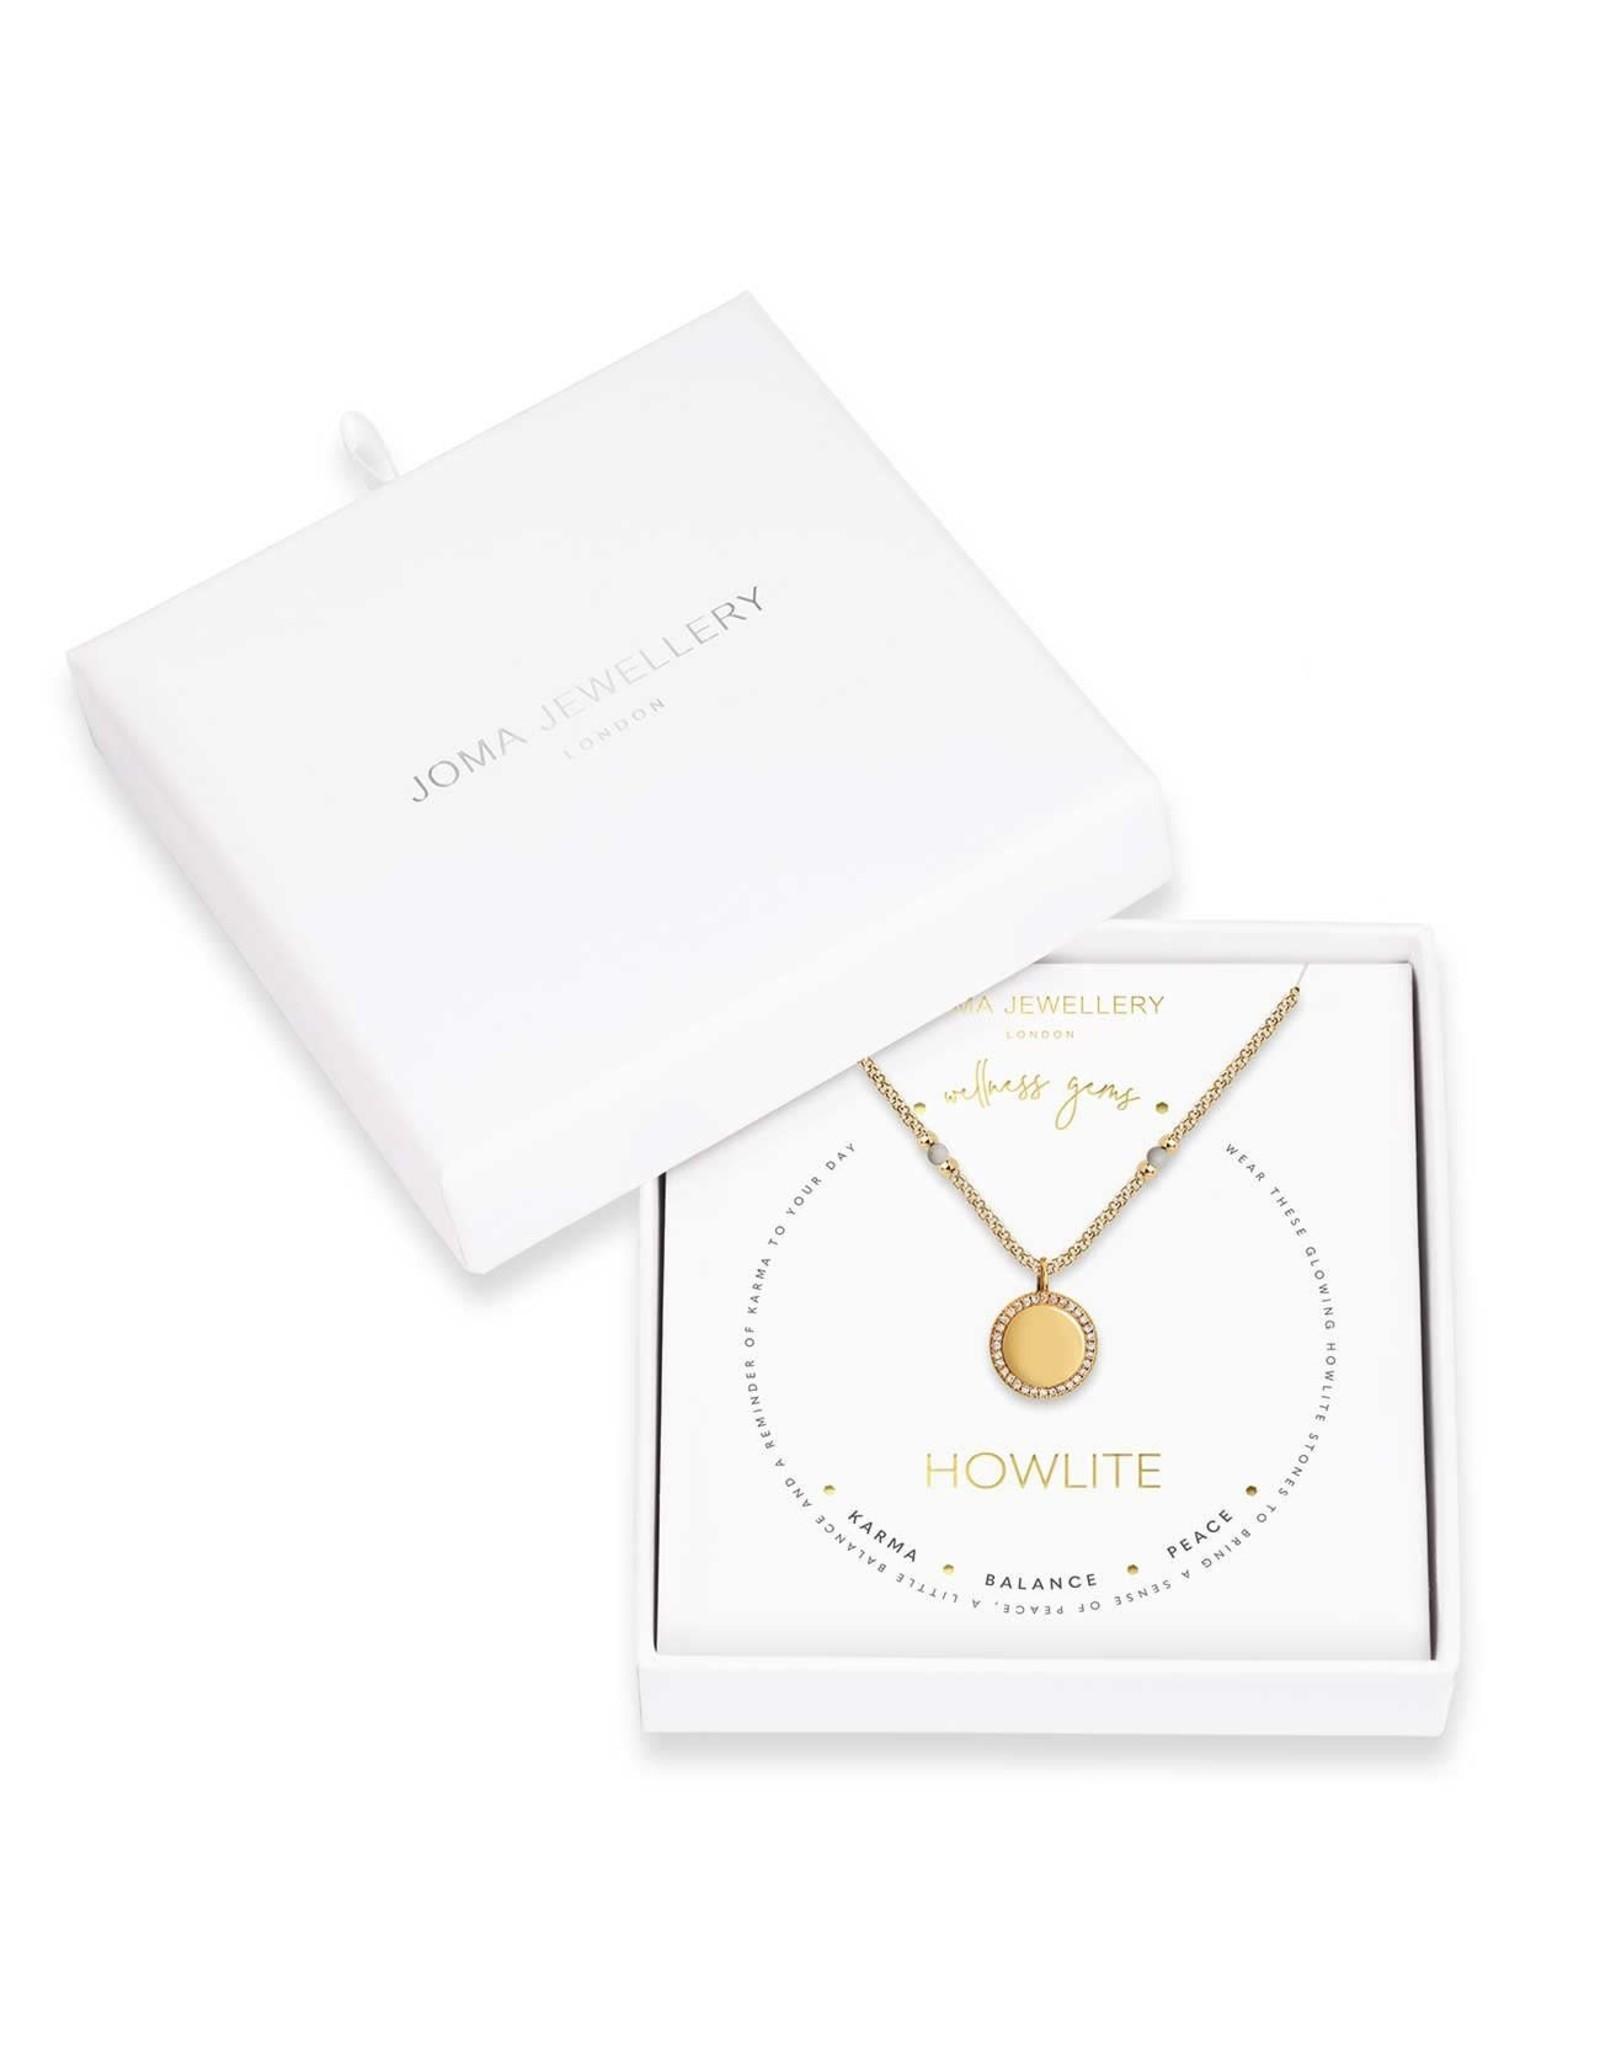 Joma Jewellery Wellness Gems - Howlite - Ketting